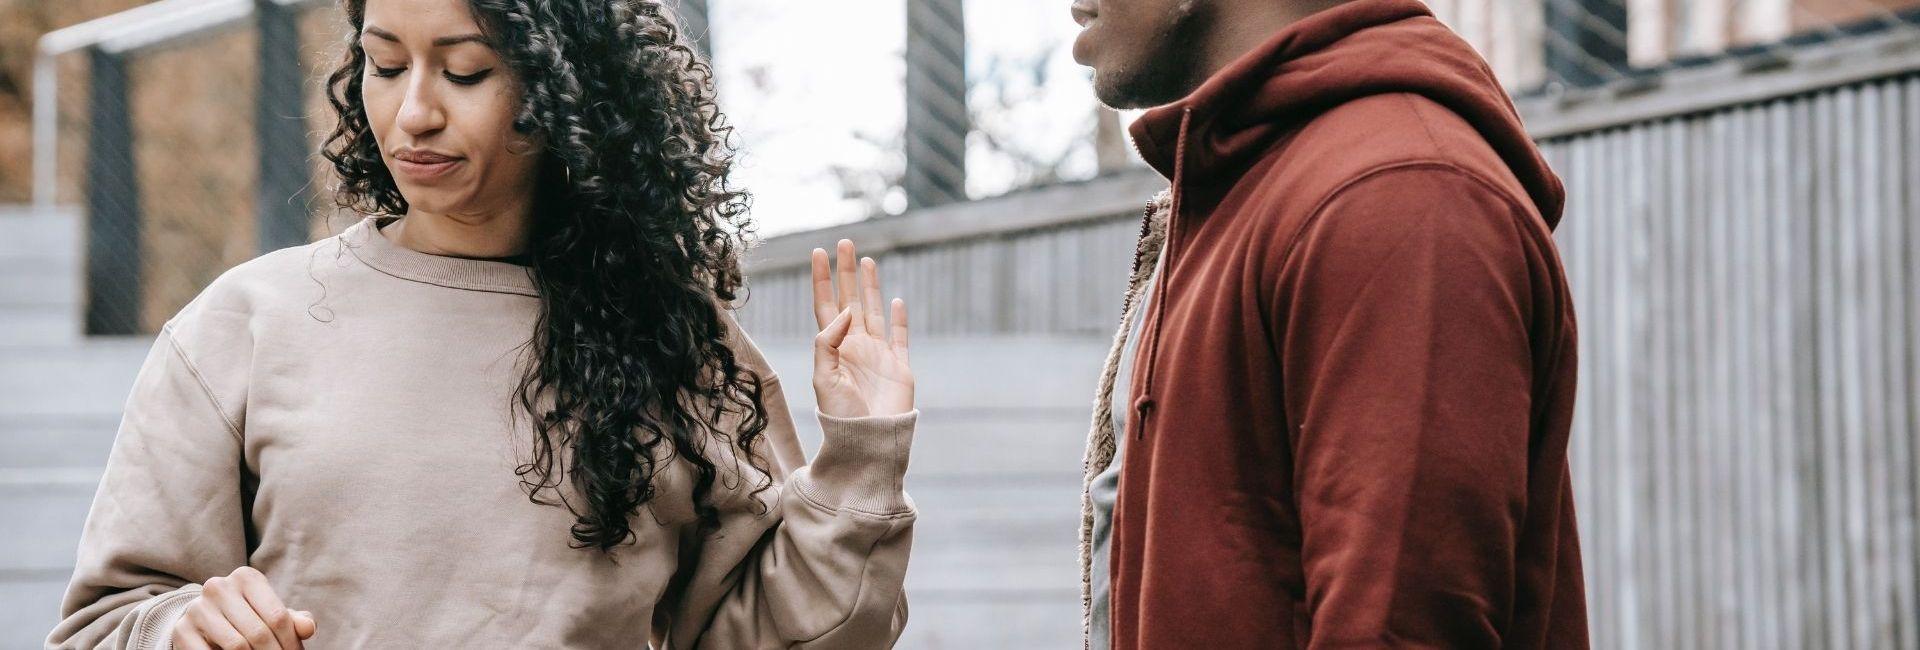 Couple – dispute – rupture – femme – homme